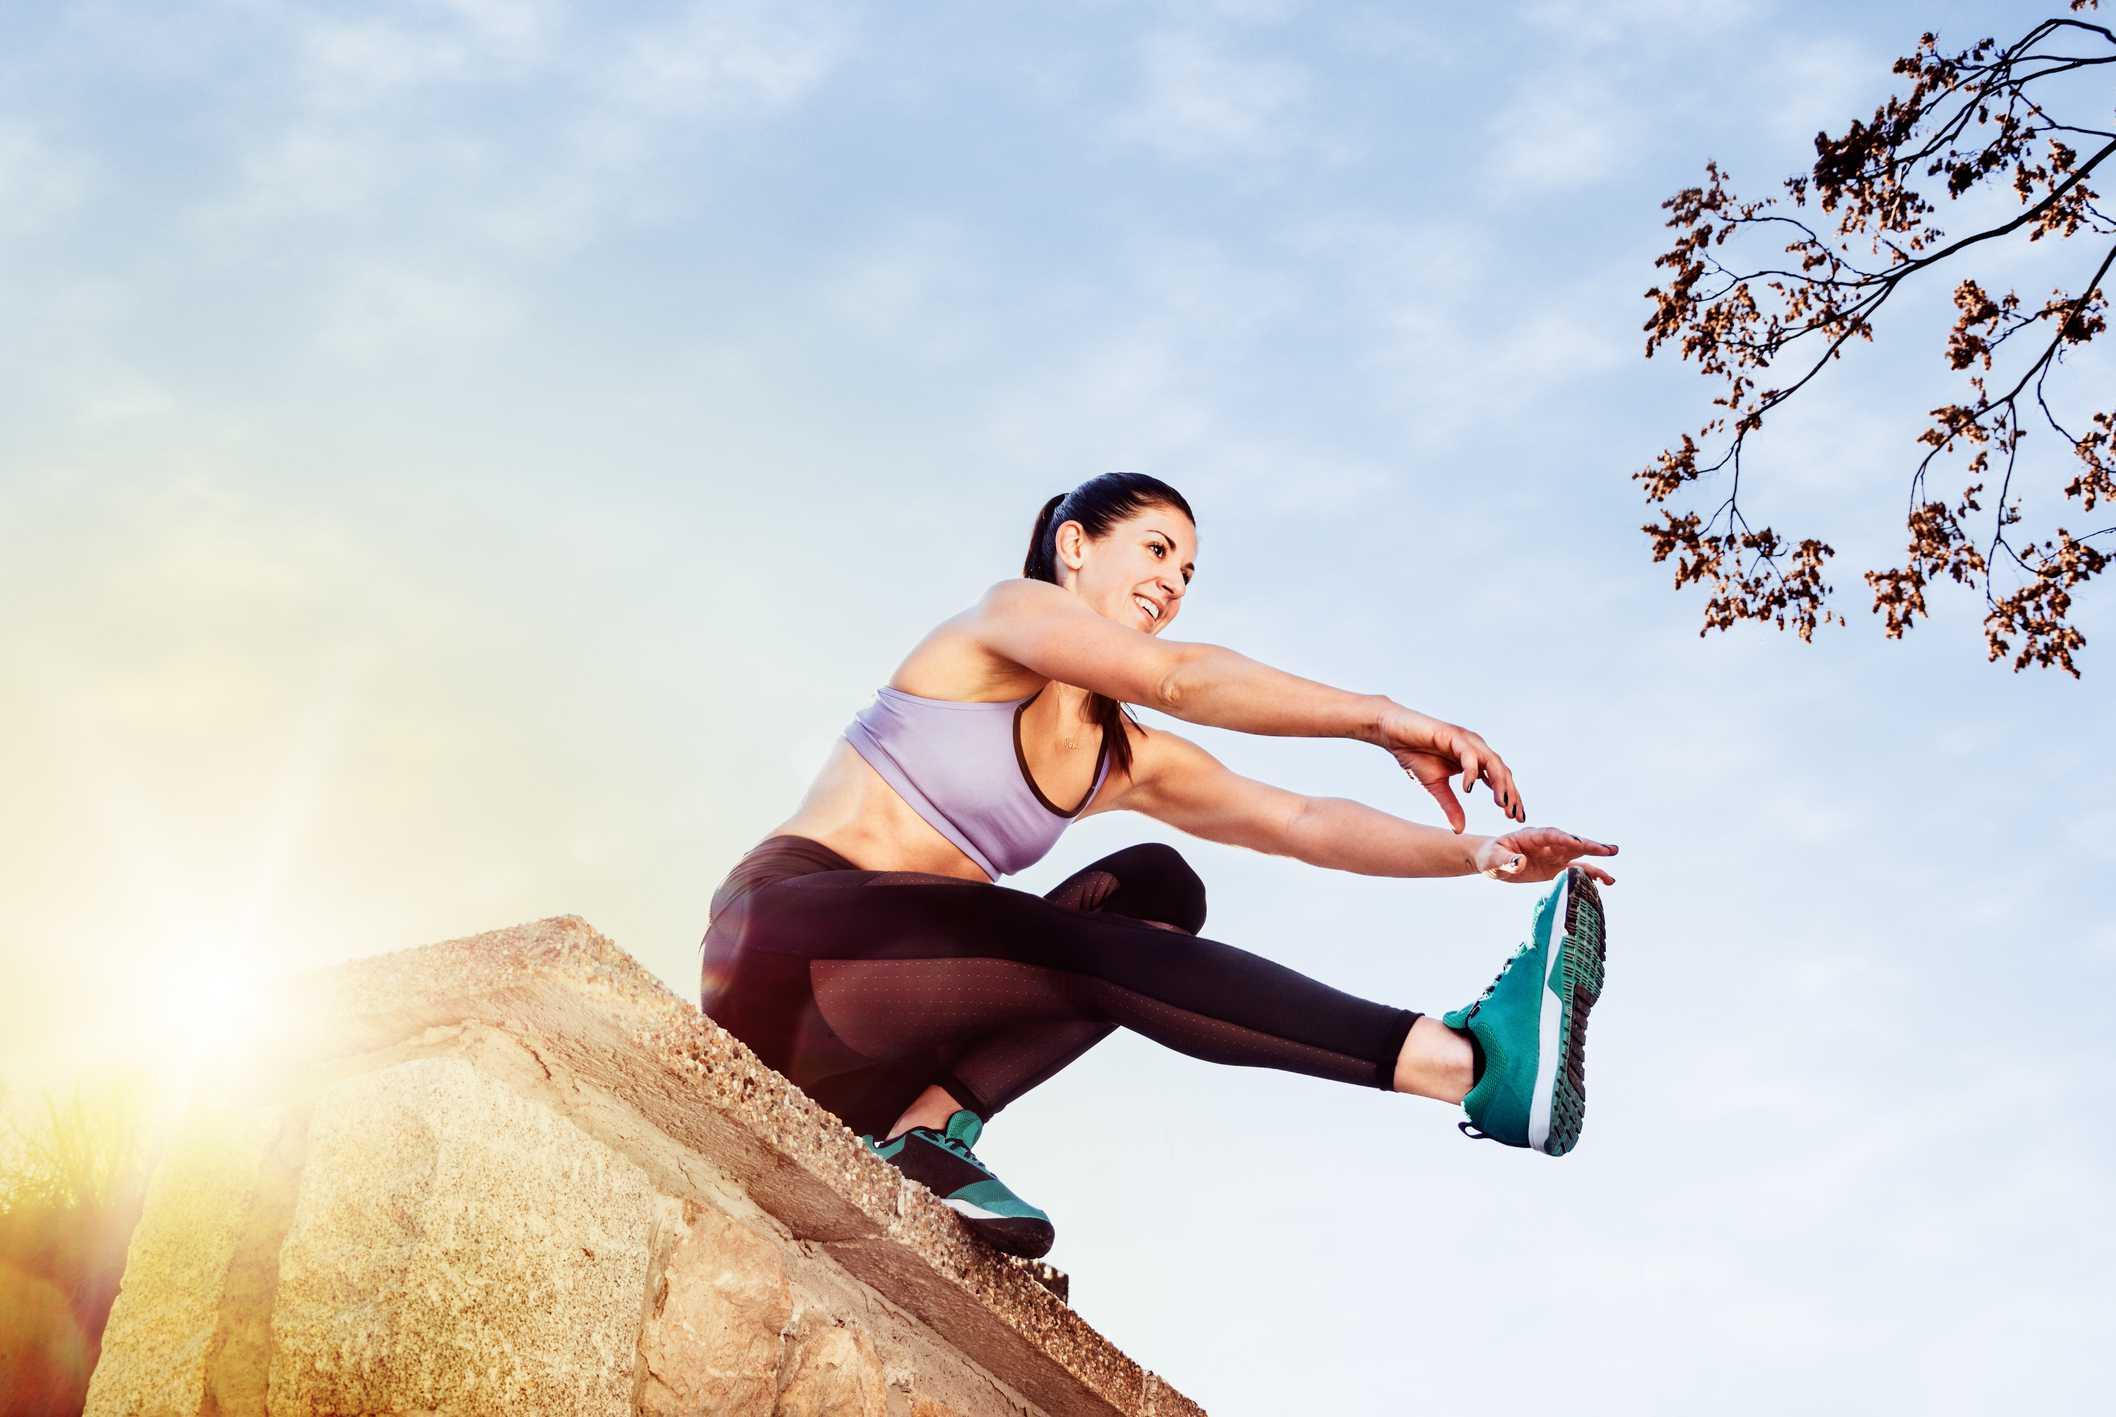 How to Do a Single-Leg Squat: Techniques, Benefits, Variations